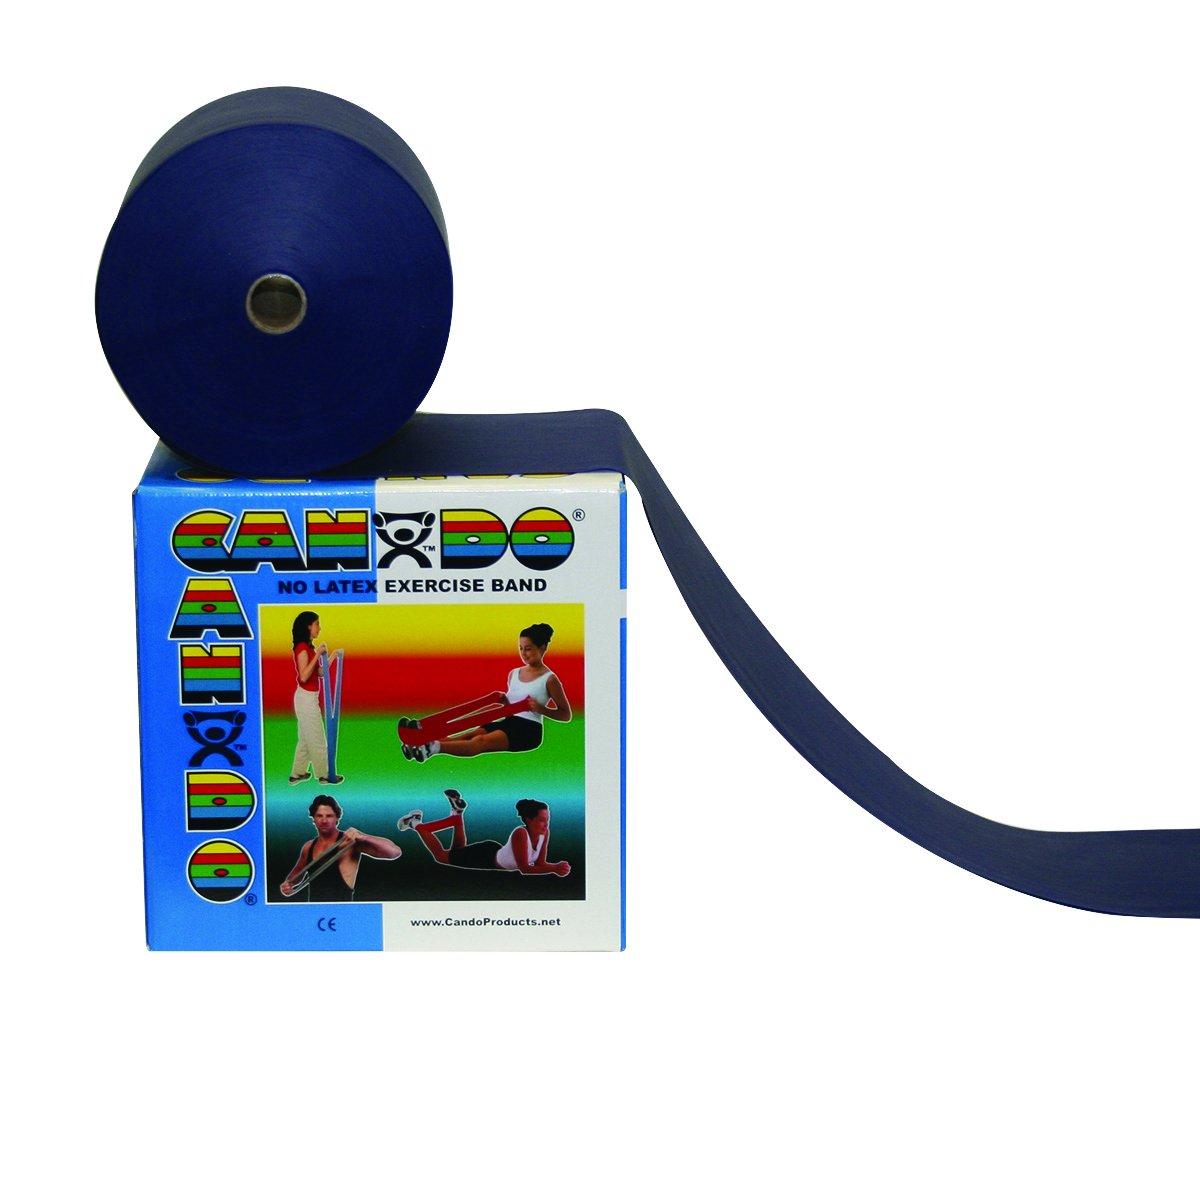 CanDo 10-5604 Latex Free Exercise Band, 4' Length, Blue-Heavy